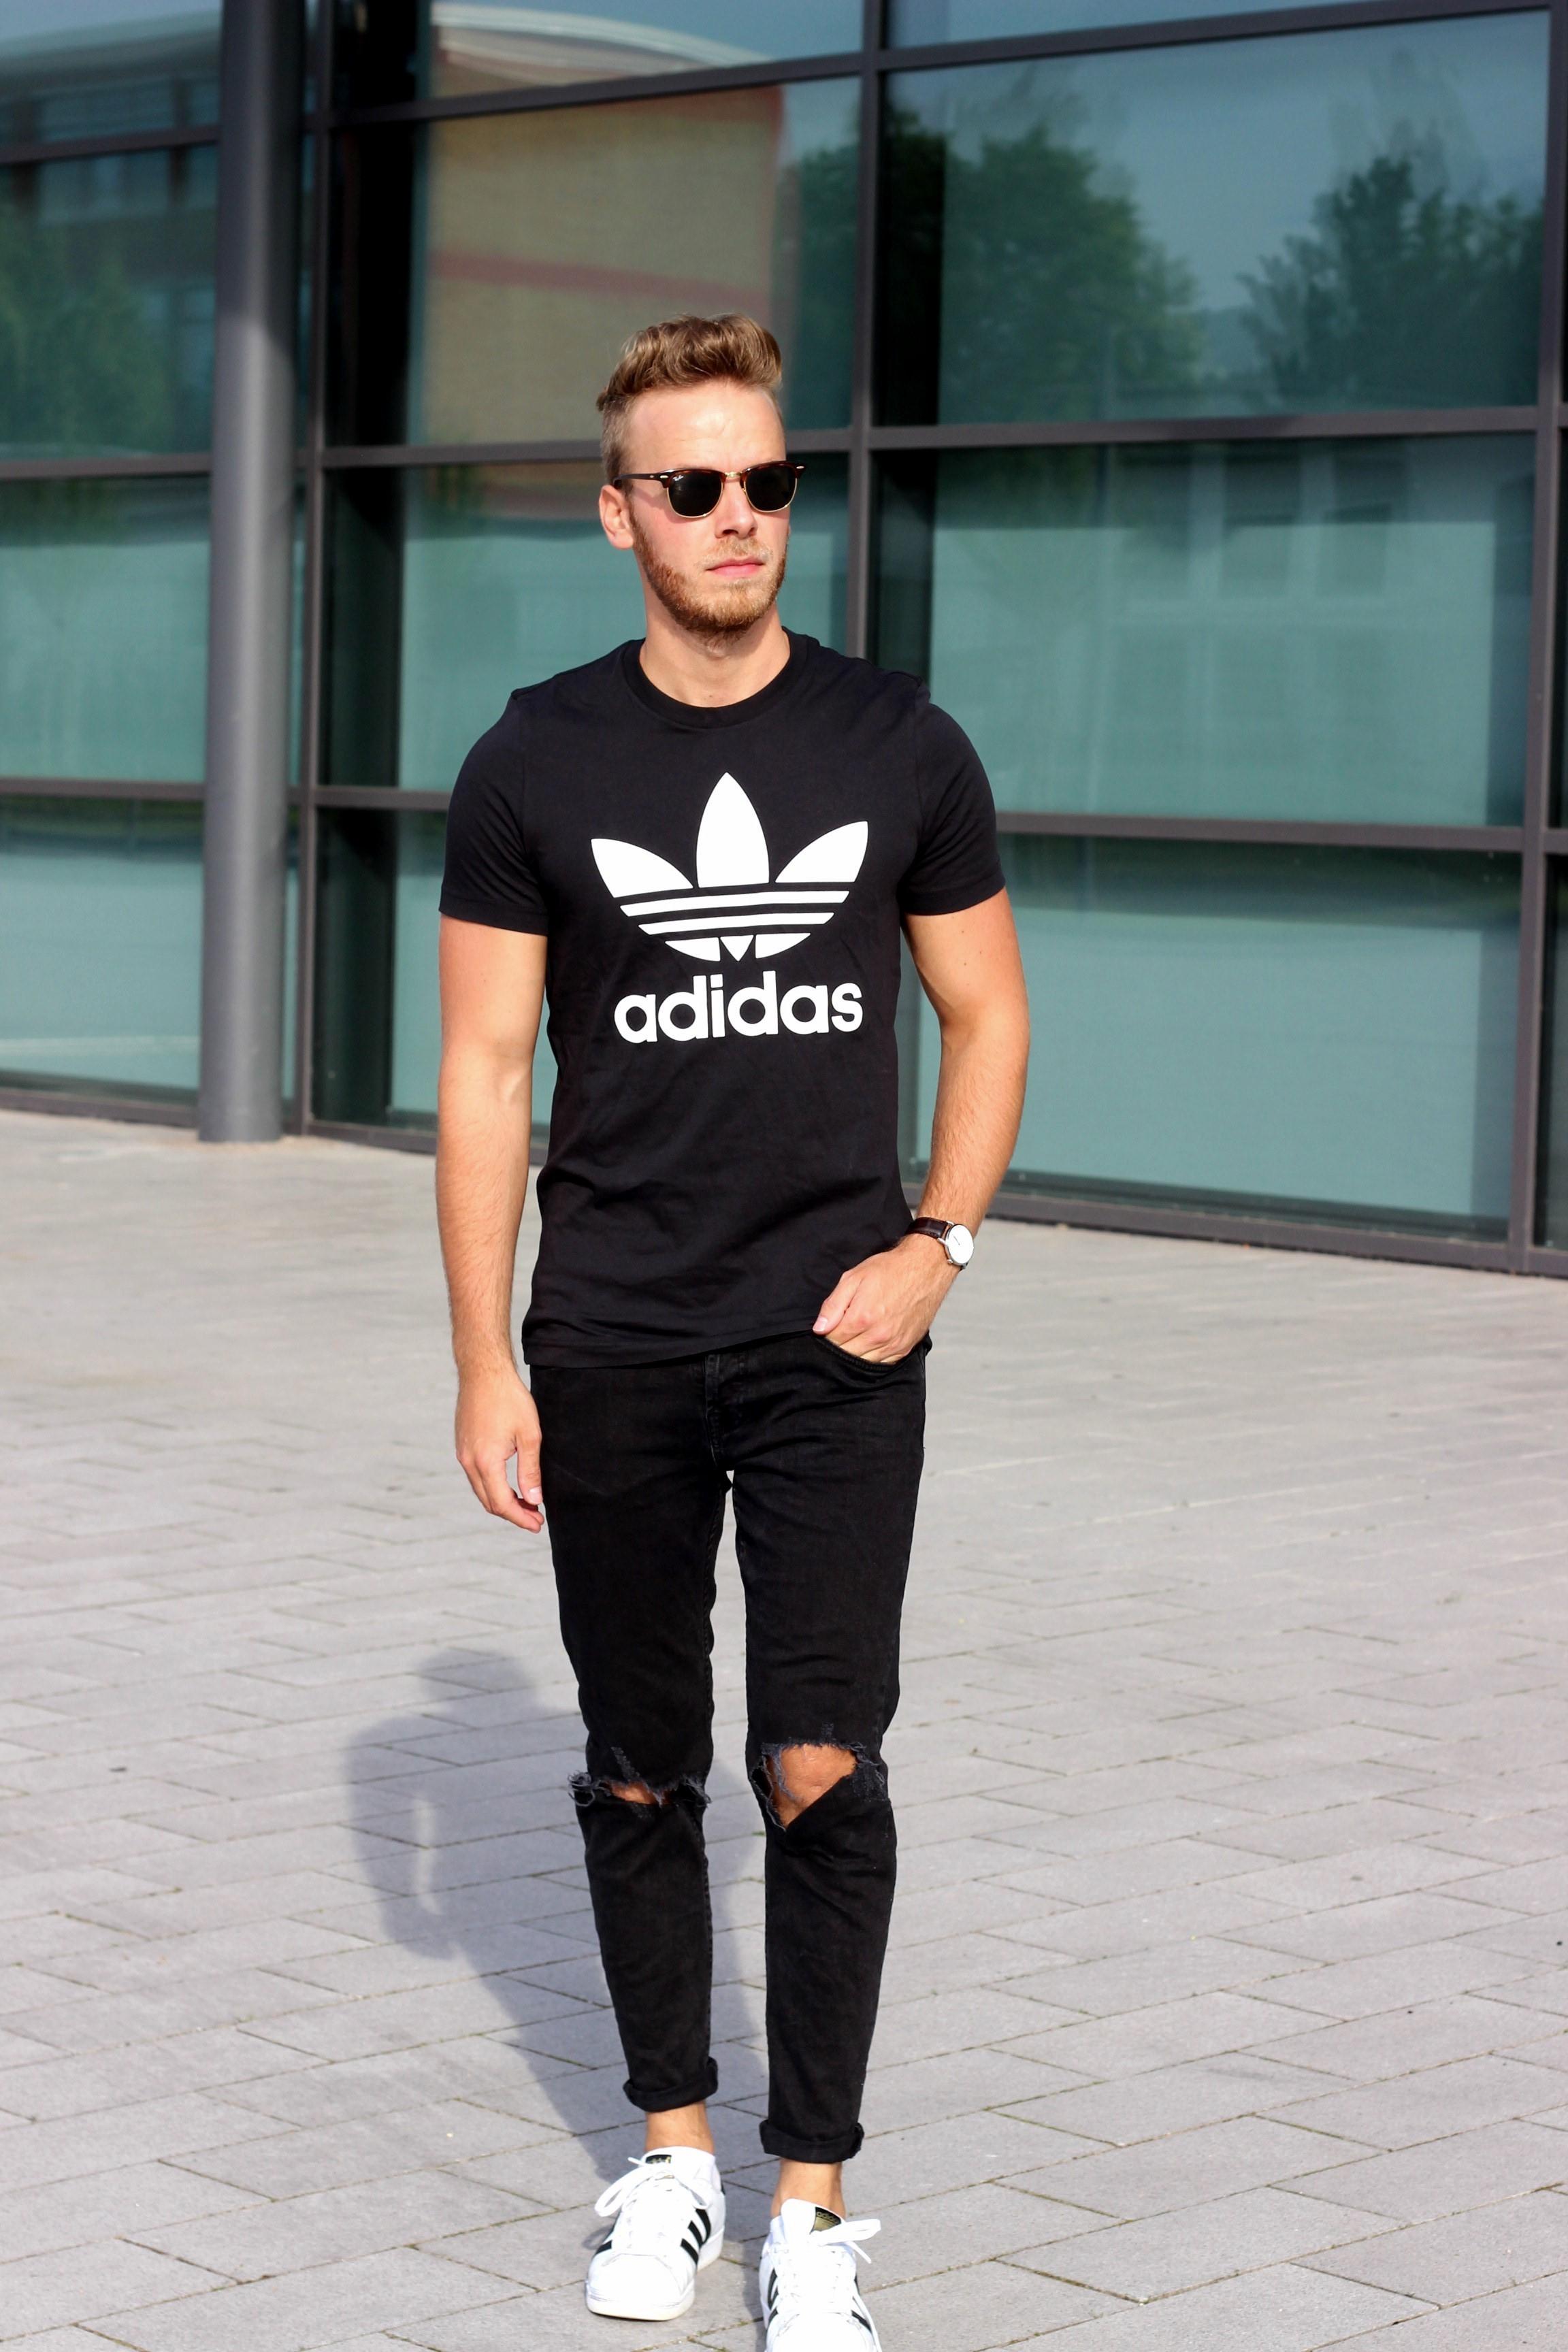 Adidas Superstar Herren Outfit Ohne-papa.de